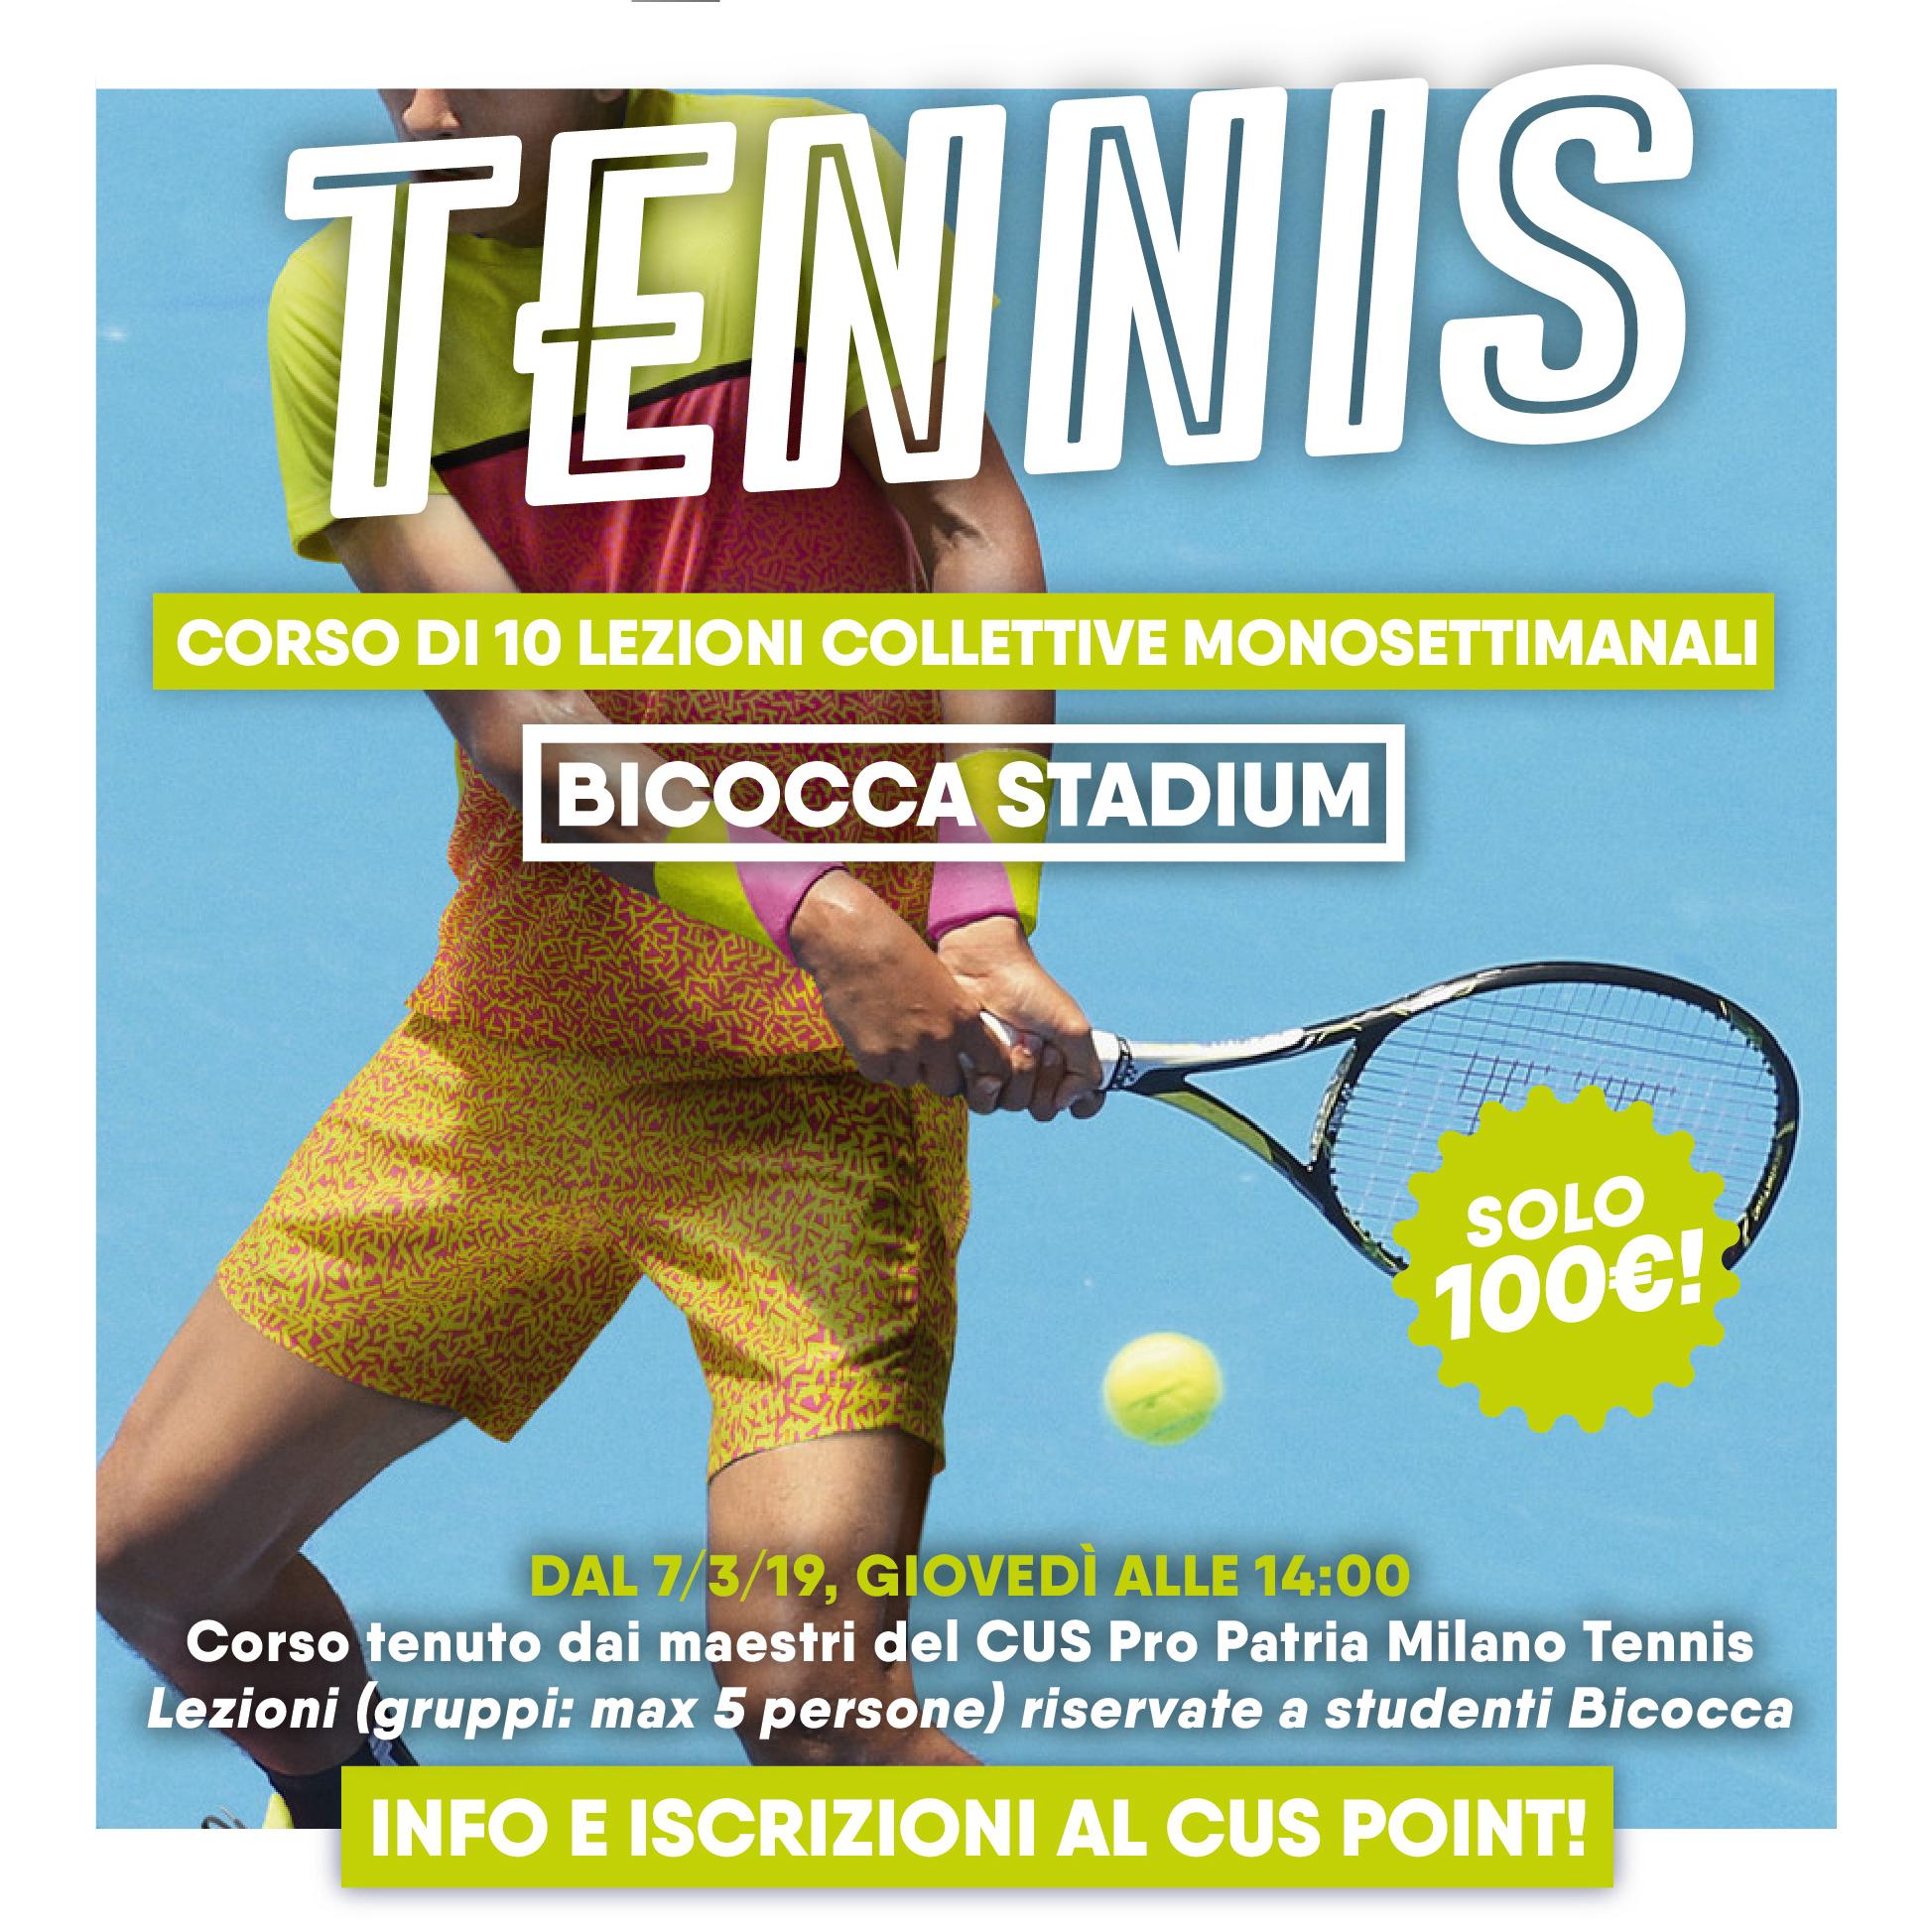 Corsi di tennis per universitari 2019 - Bicocca Stadium